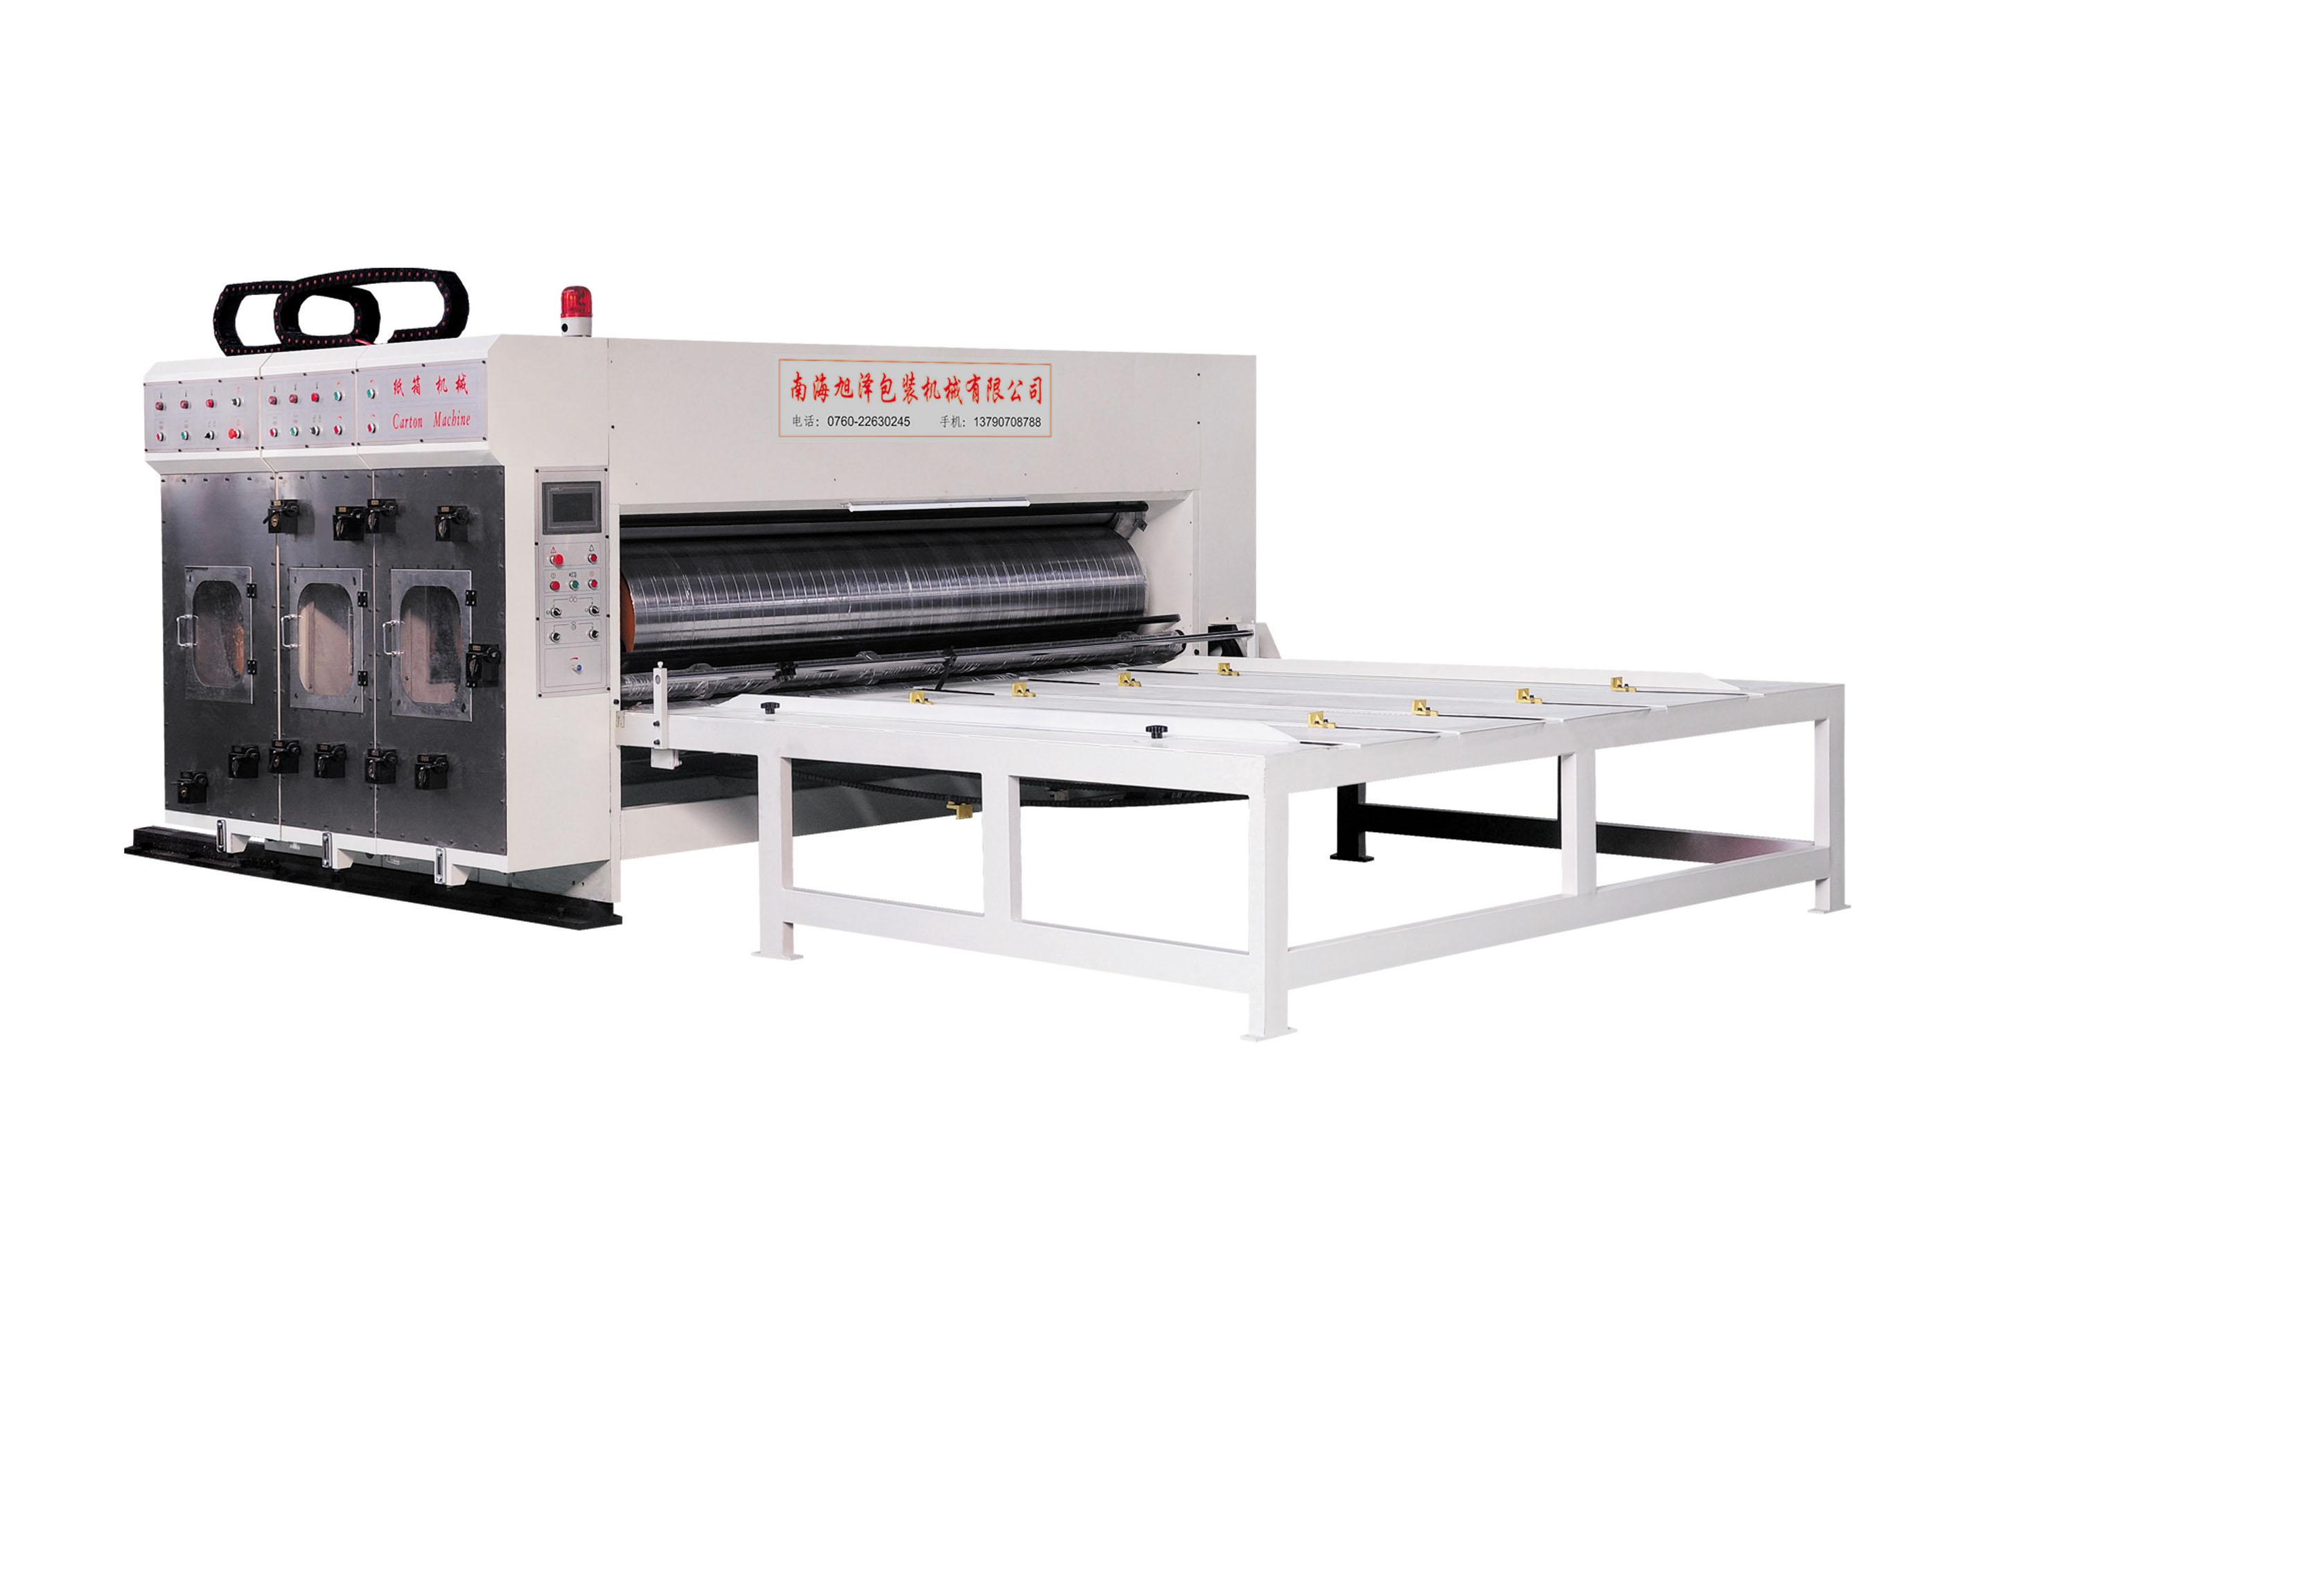 xz瓦楞紙闆多色印刷開槽機